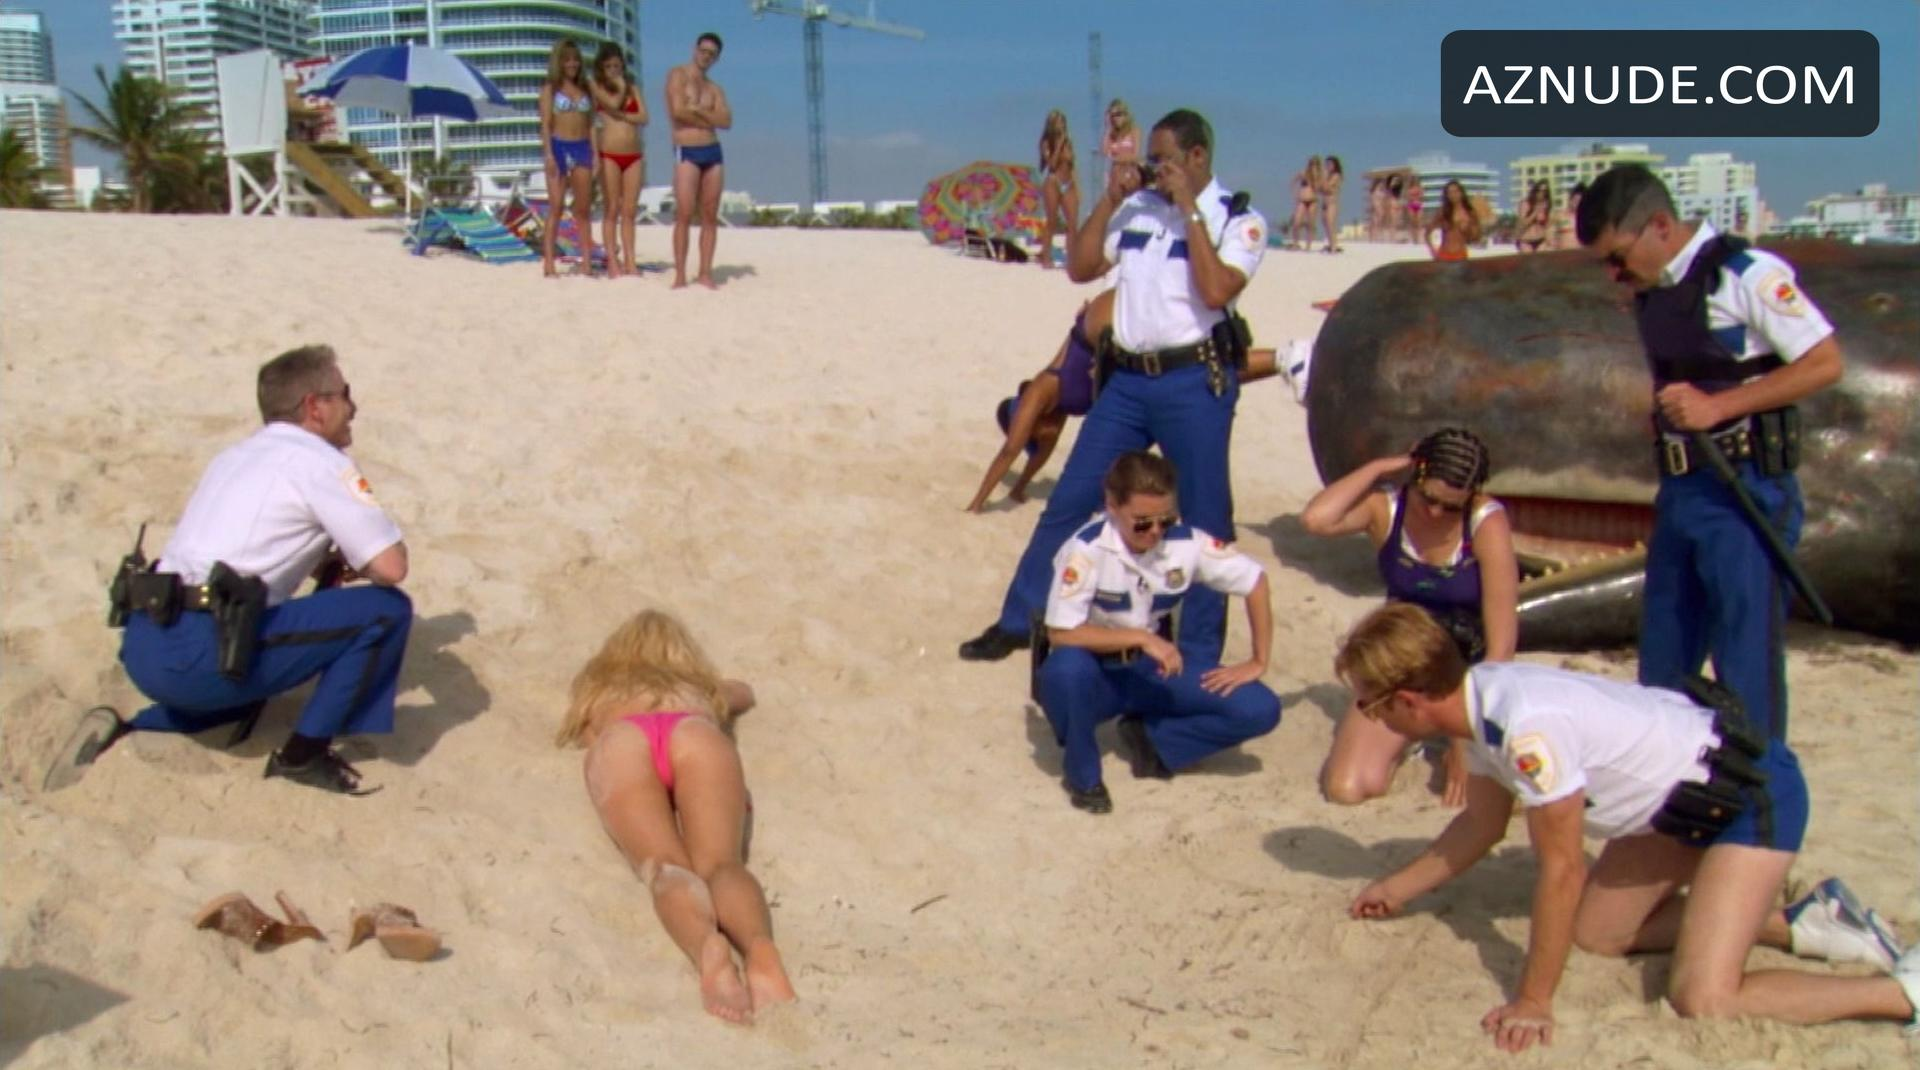 Irina voronina topless reno 911 miami 2007 6